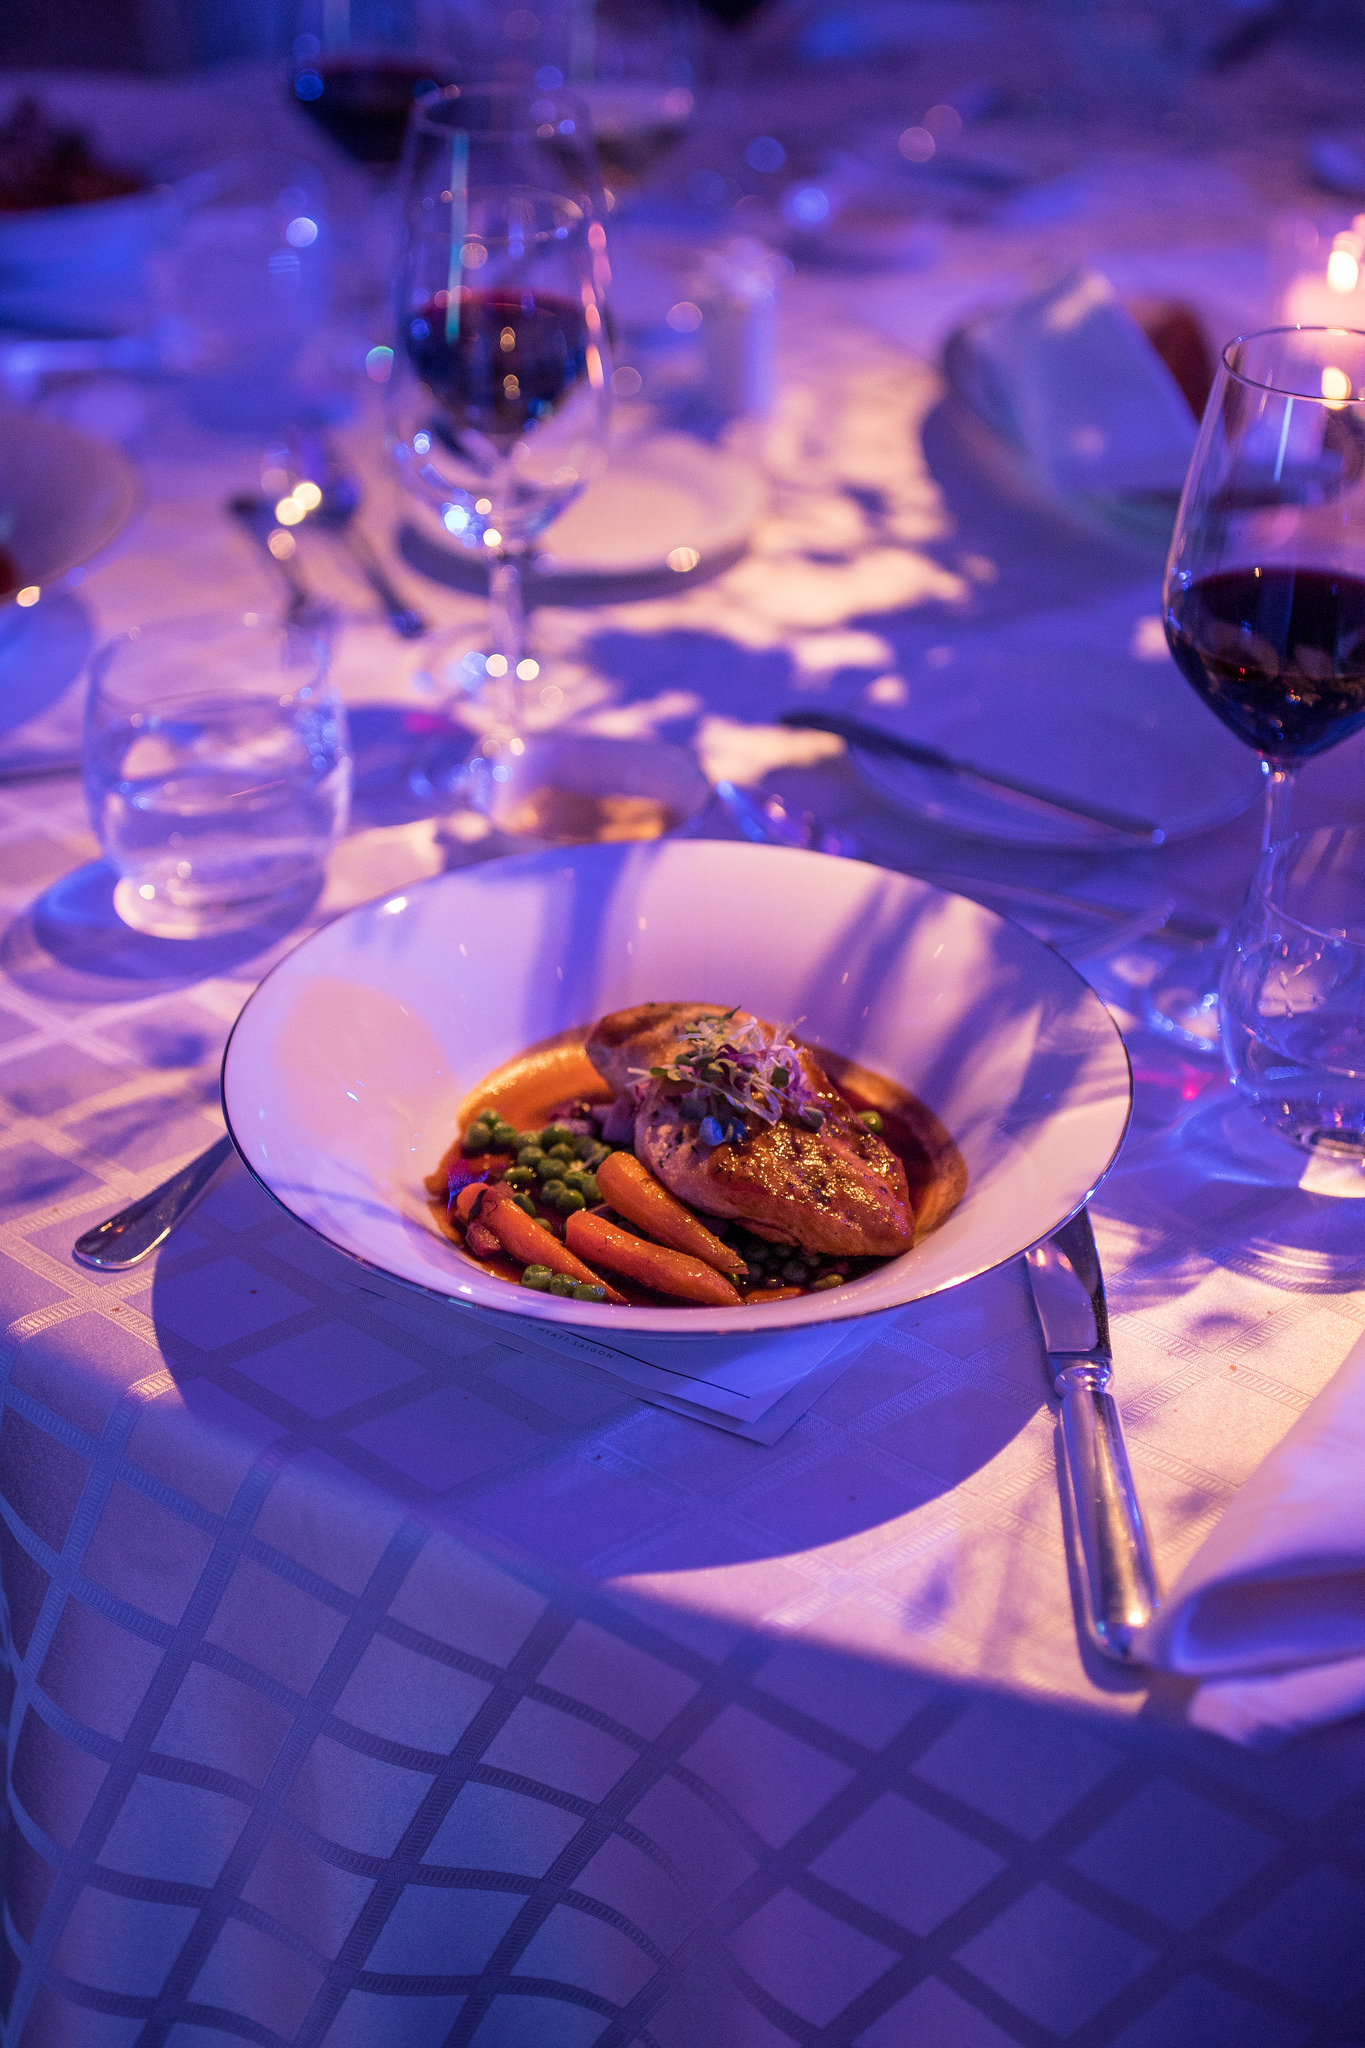 premium-glamourous-foodphotography-thatsluminous.jpg